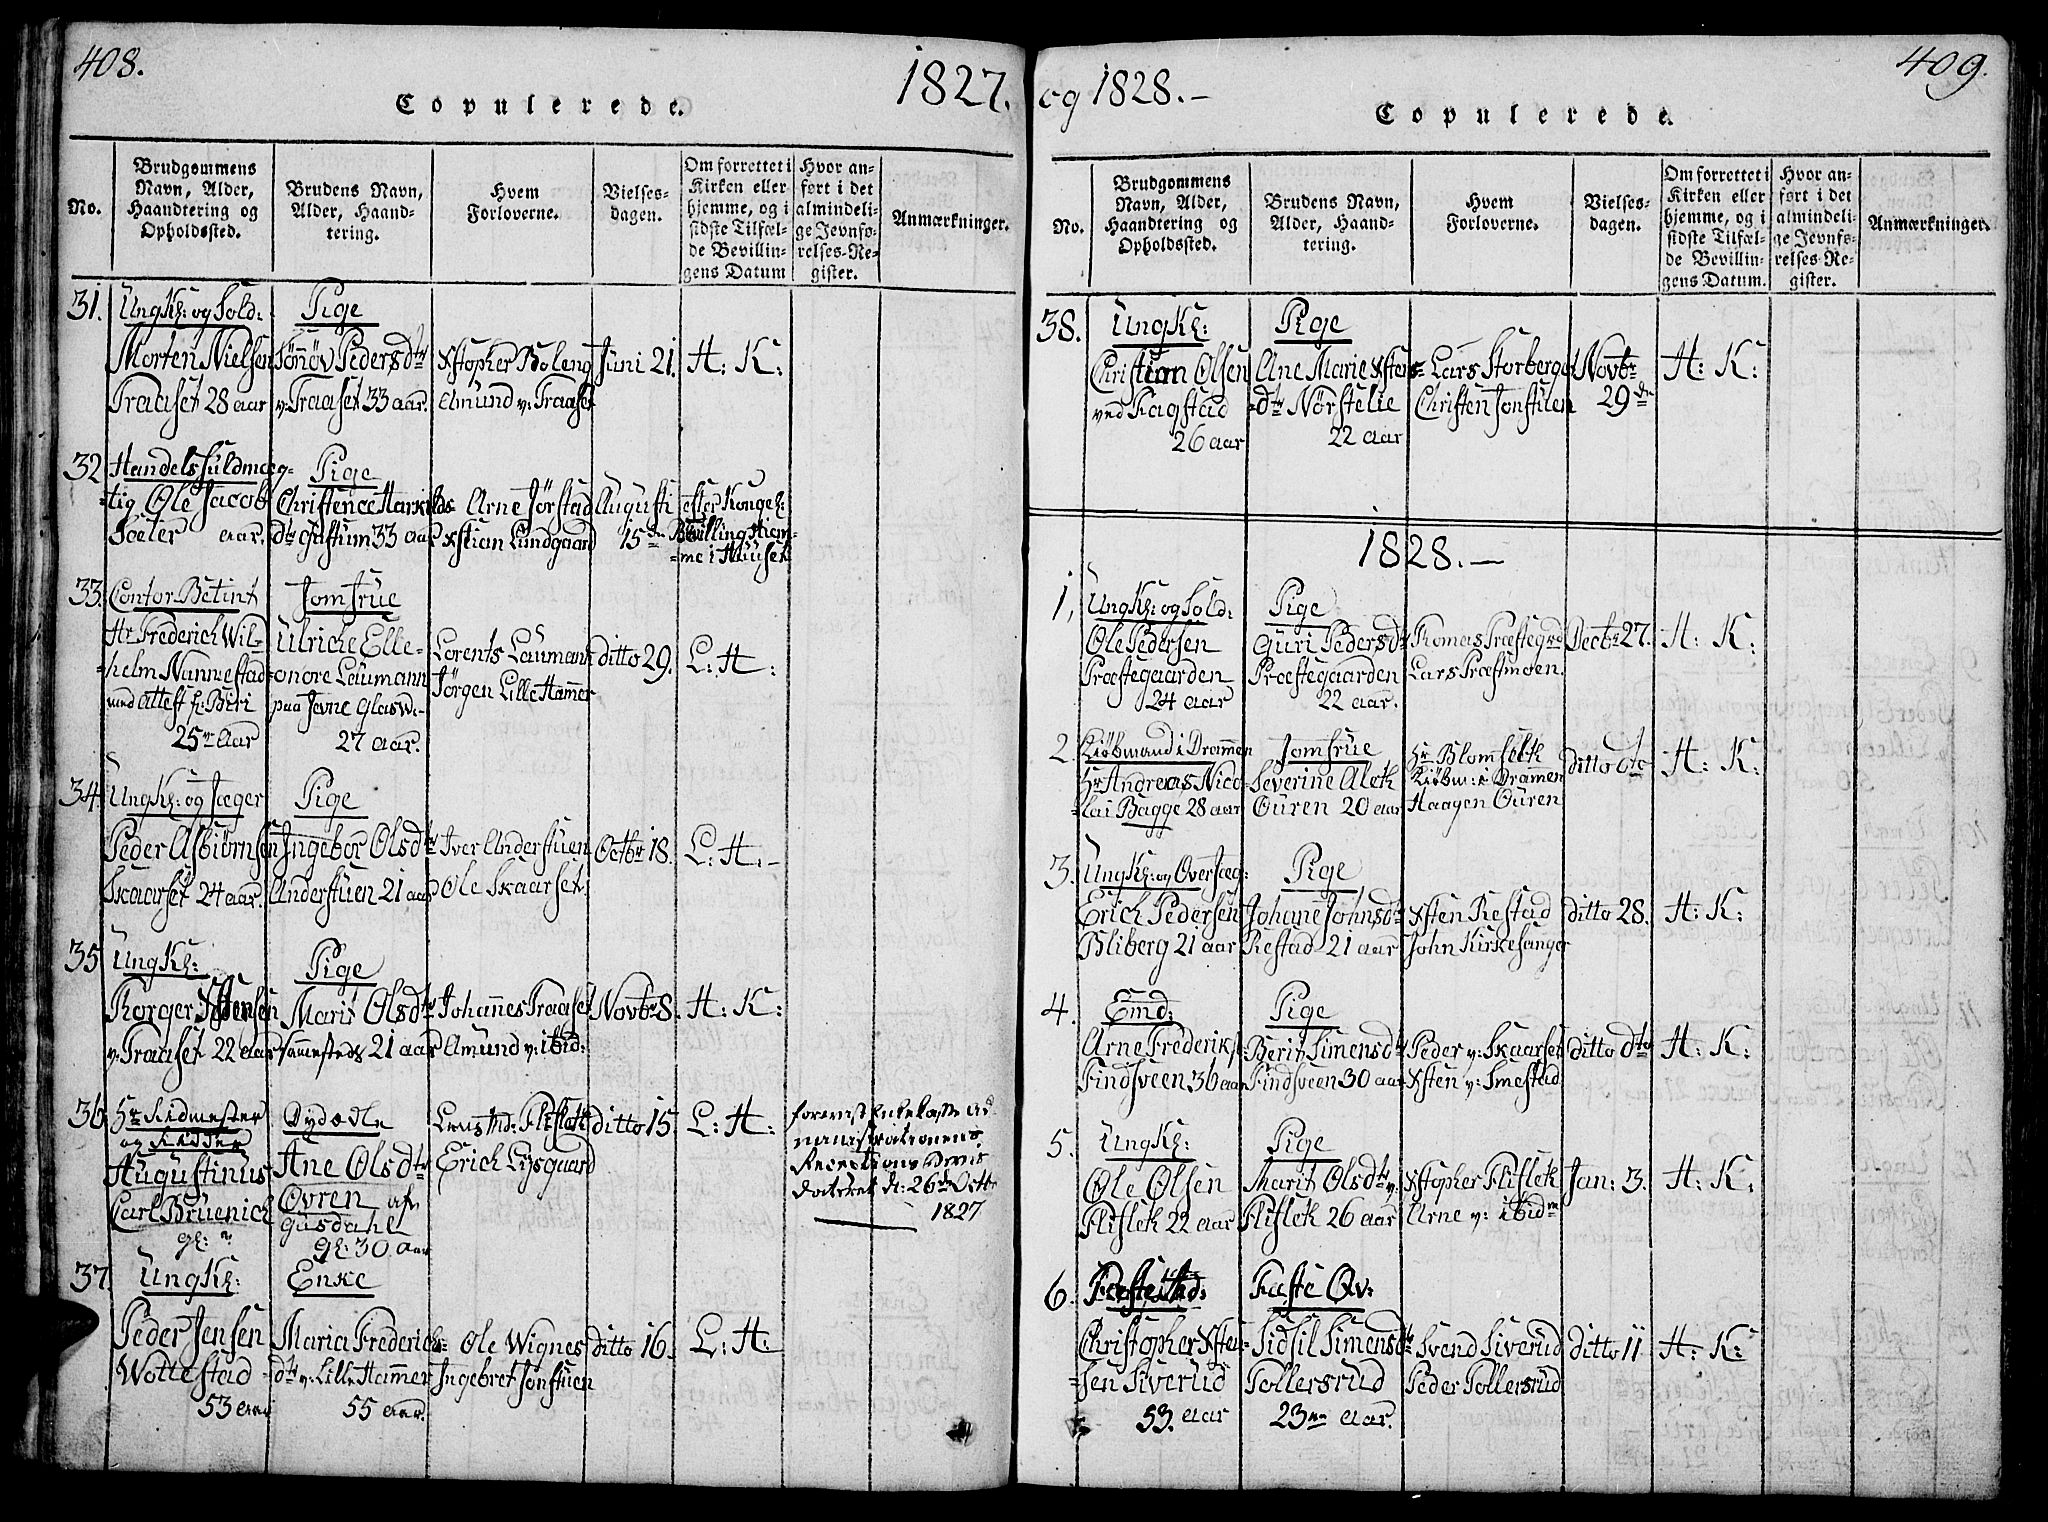 SAH, Fåberg prestekontor, Klokkerbok nr. 4, 1818-1837, s. 408-409